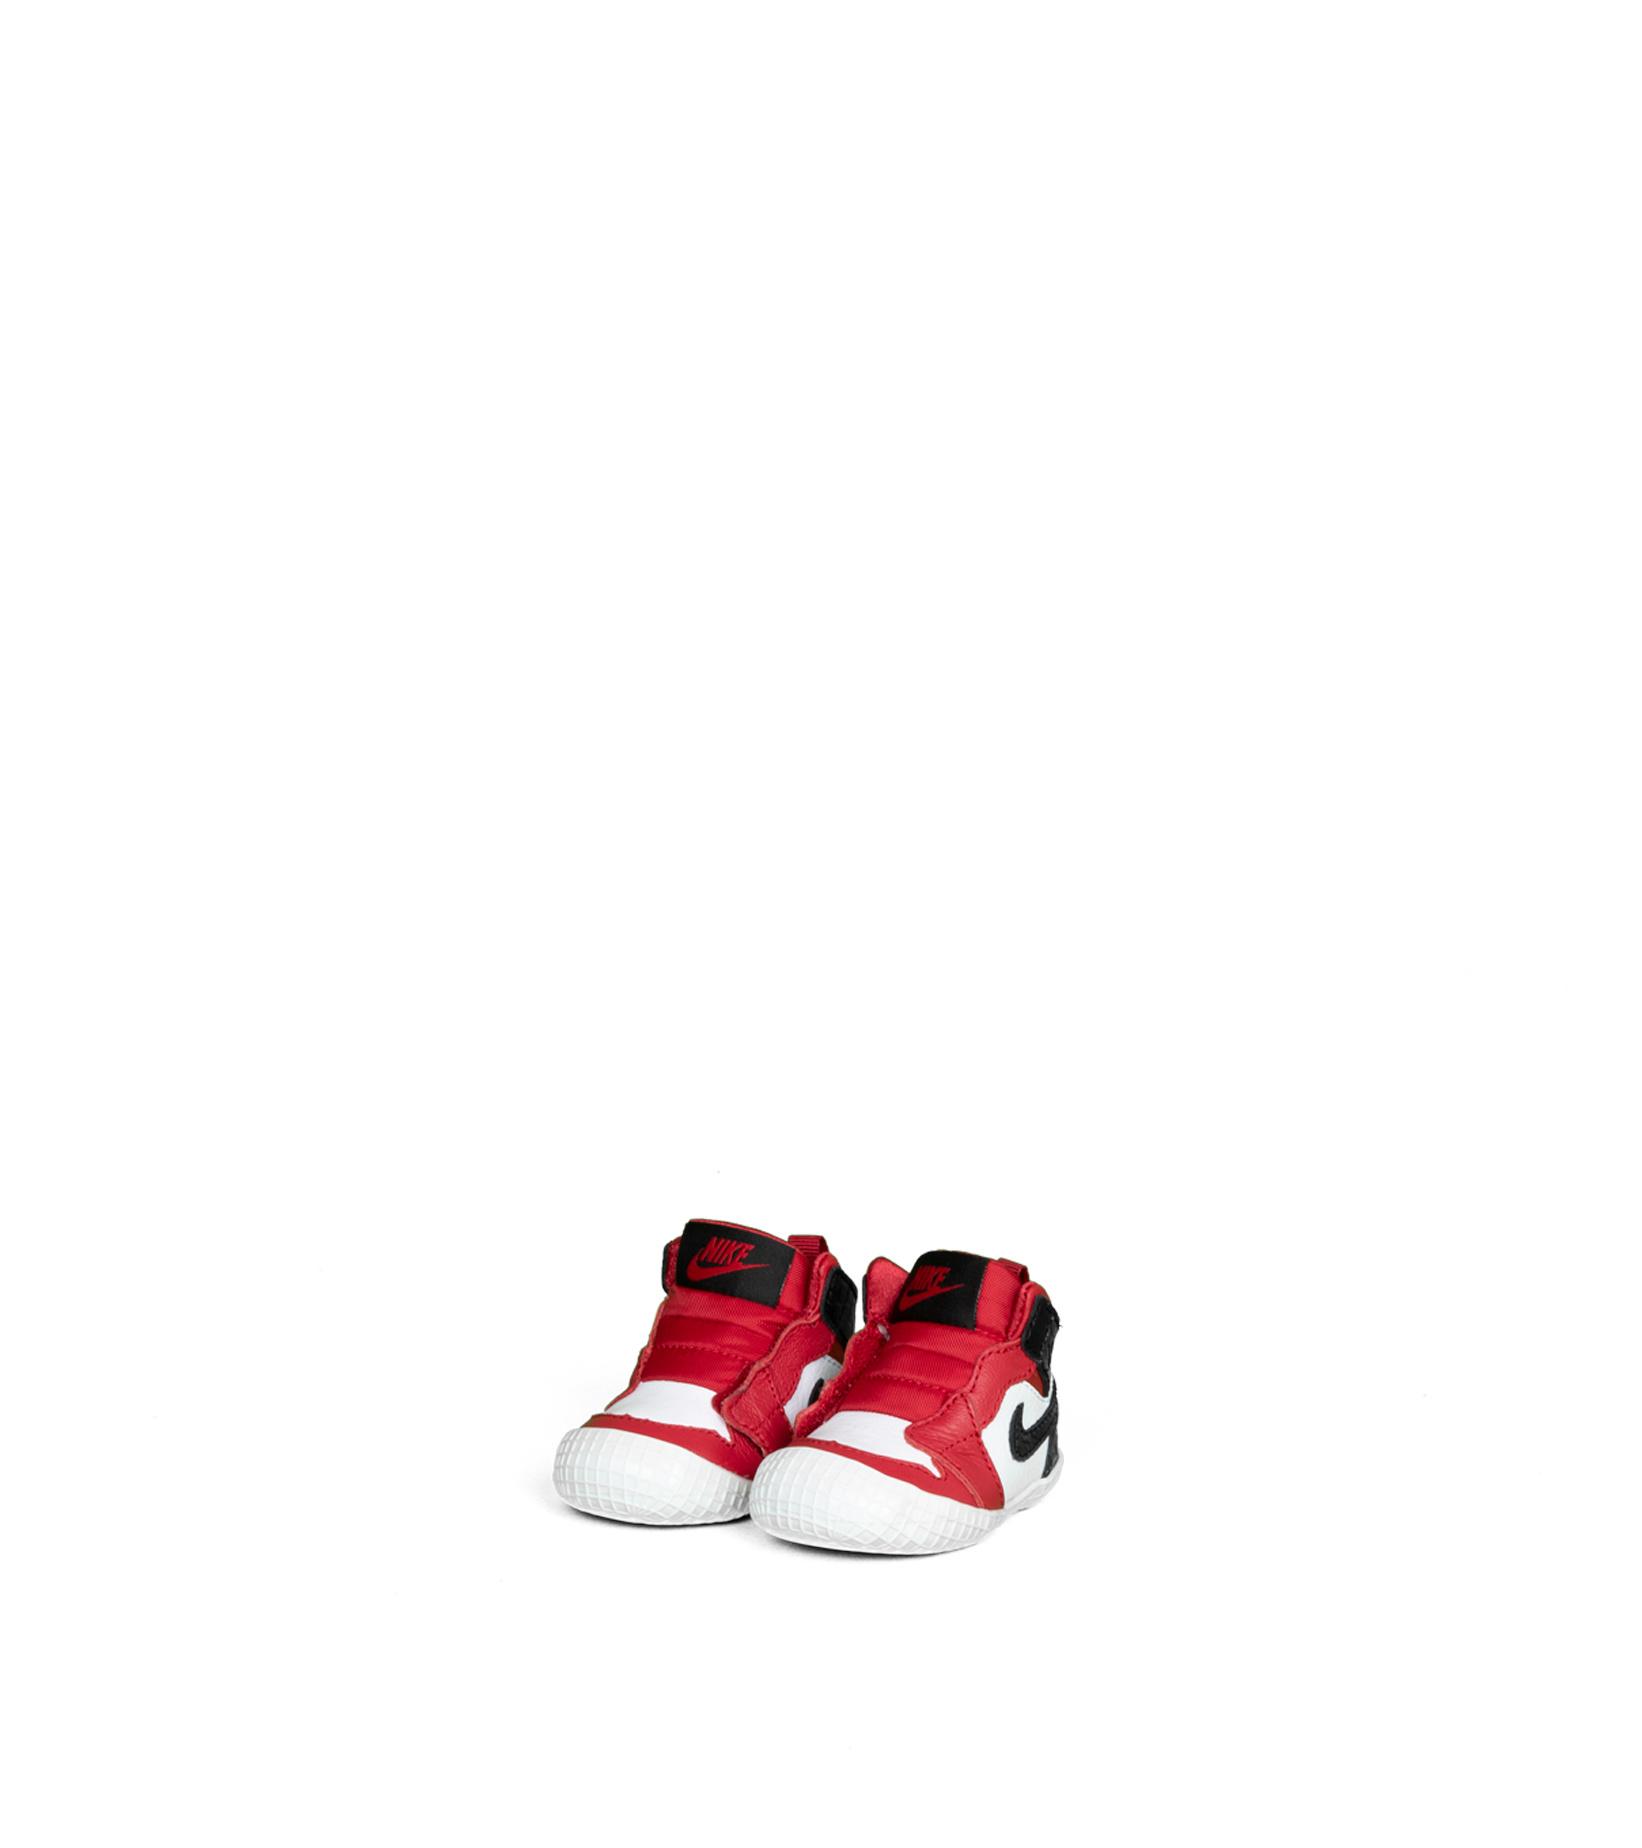 "1 Crib Bootie (TD)  ""Gym Red/Black""-1"